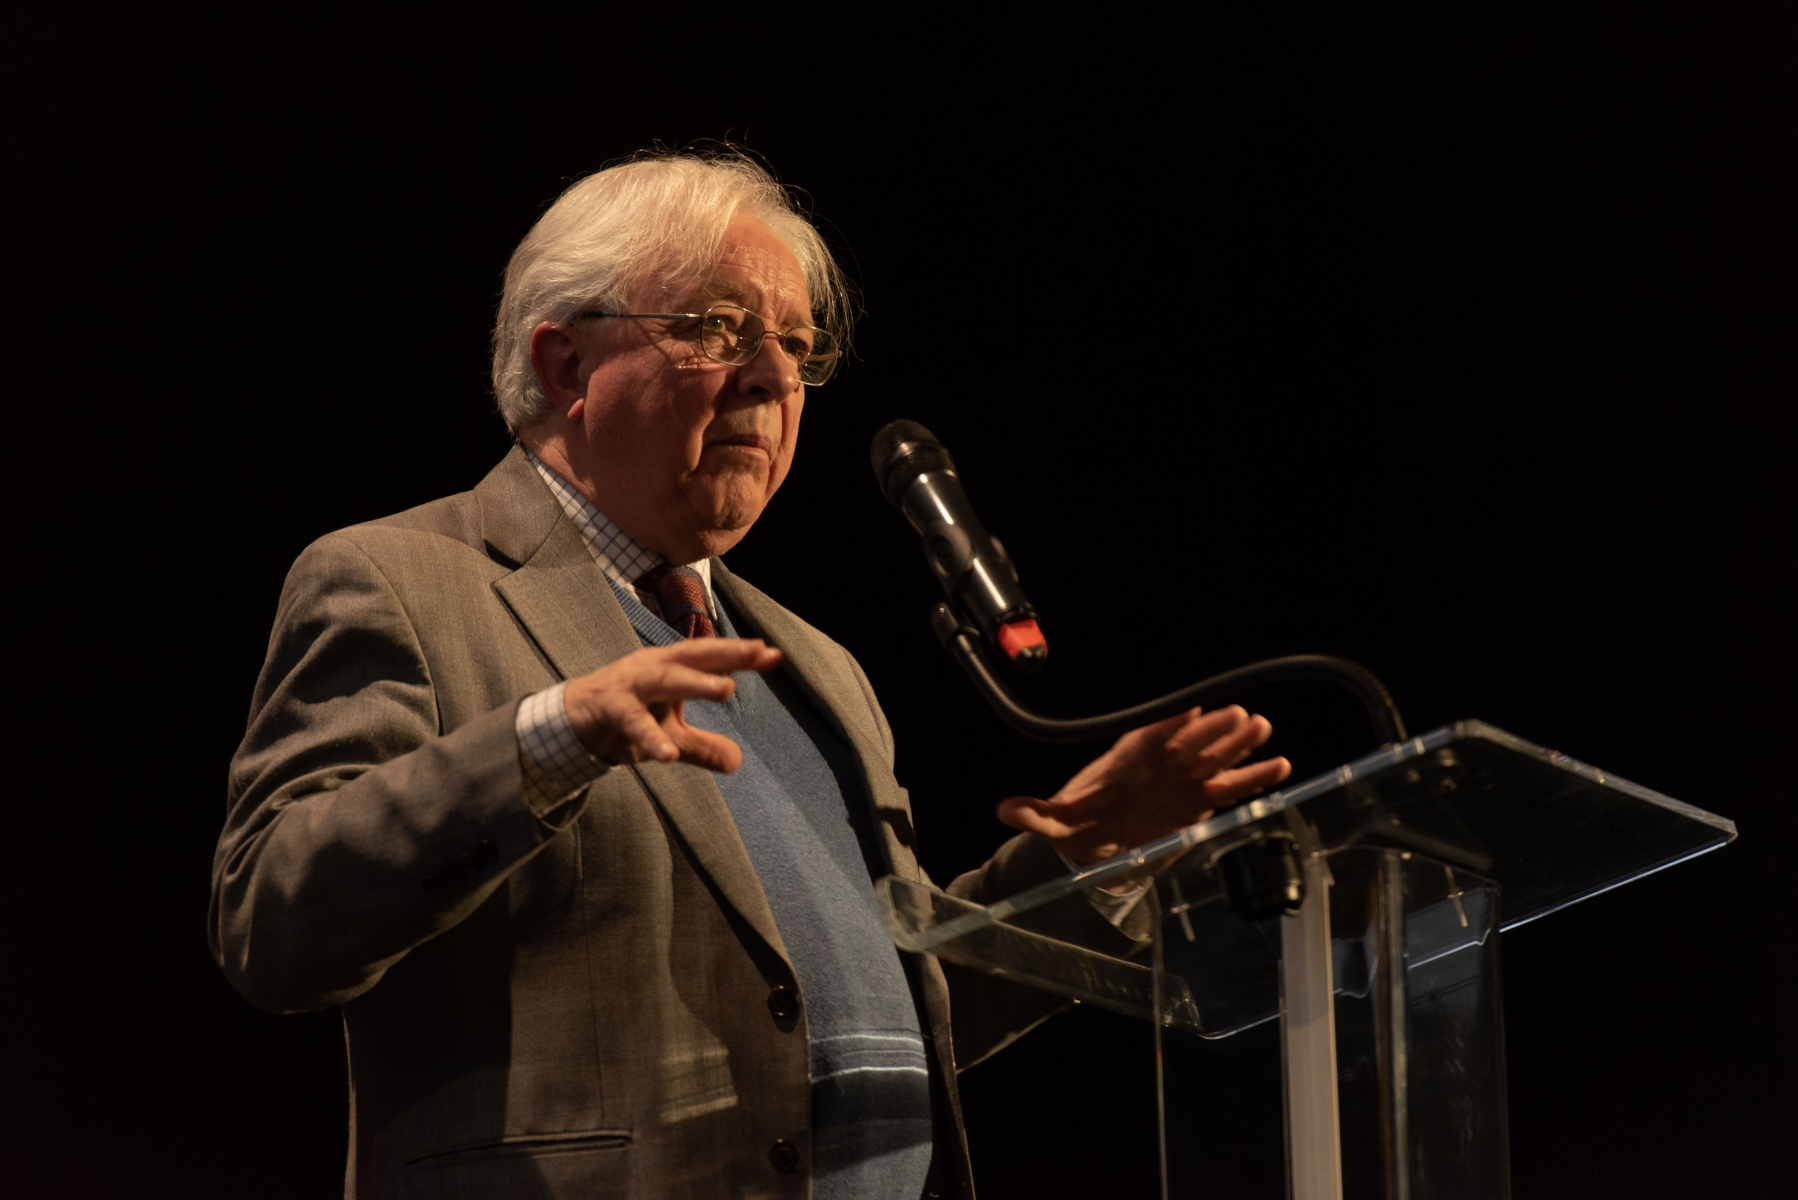 Hugh Macdonald at the Berlioz 150 Anniversary event